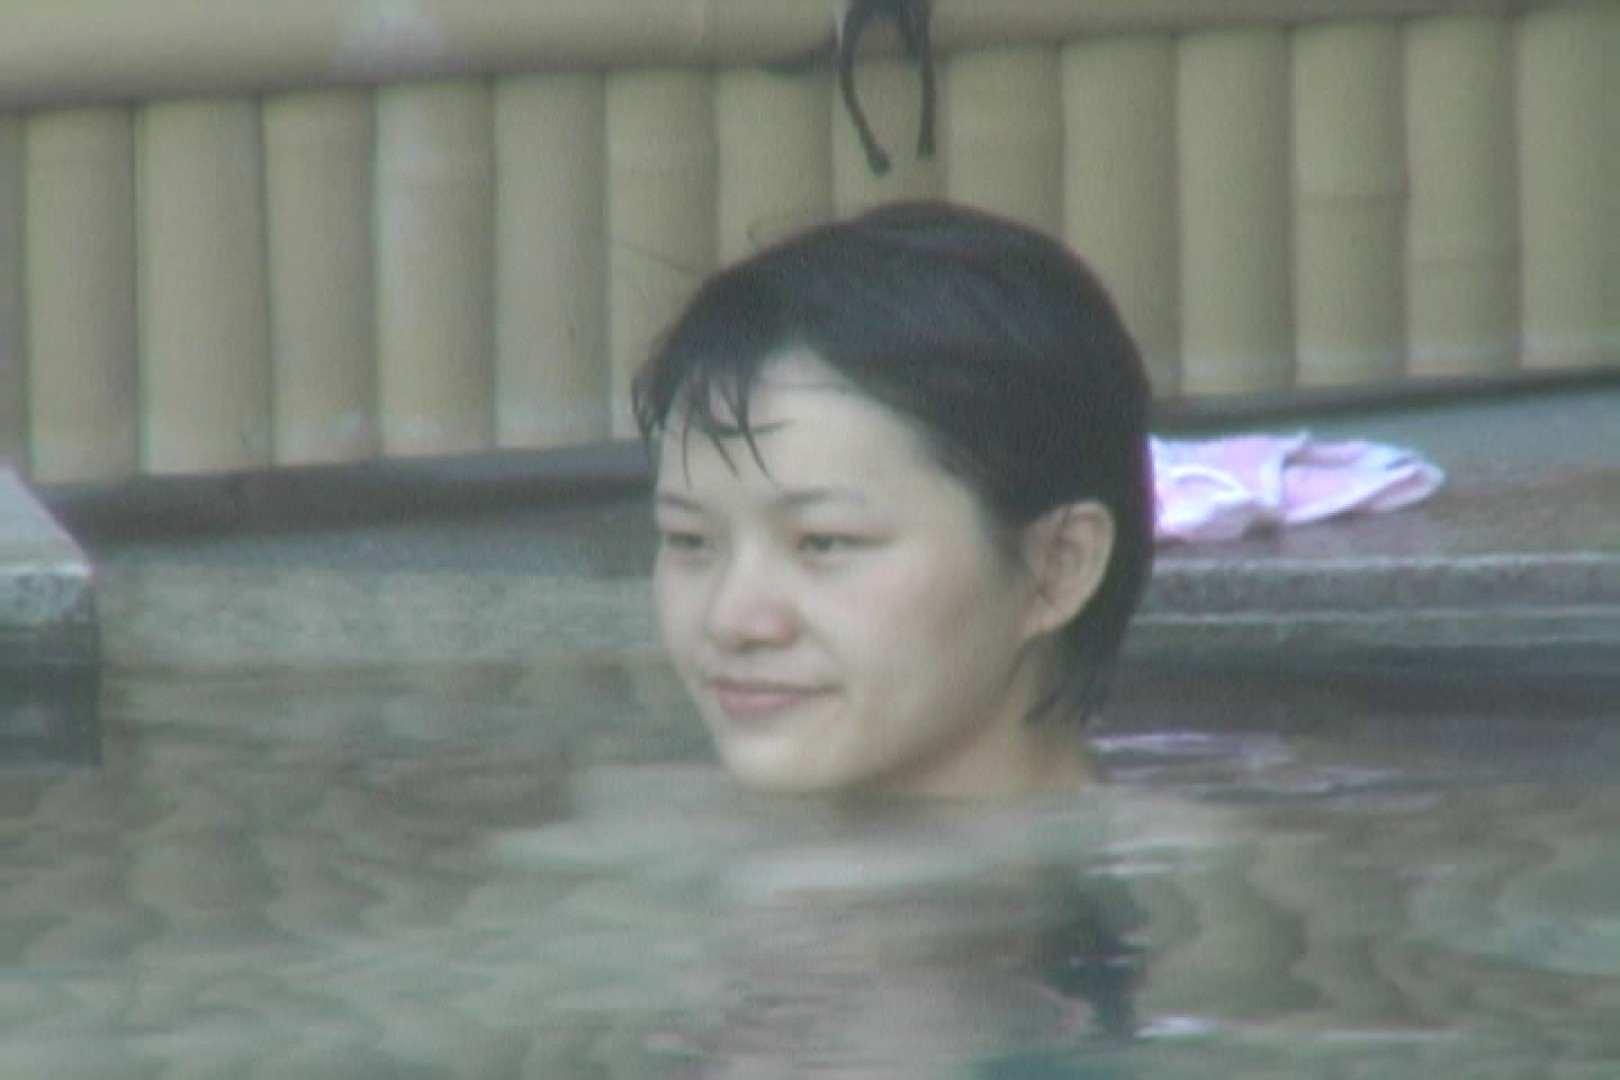 Aquaな露天風呂Vol.116 露天風呂編  107PIX 72